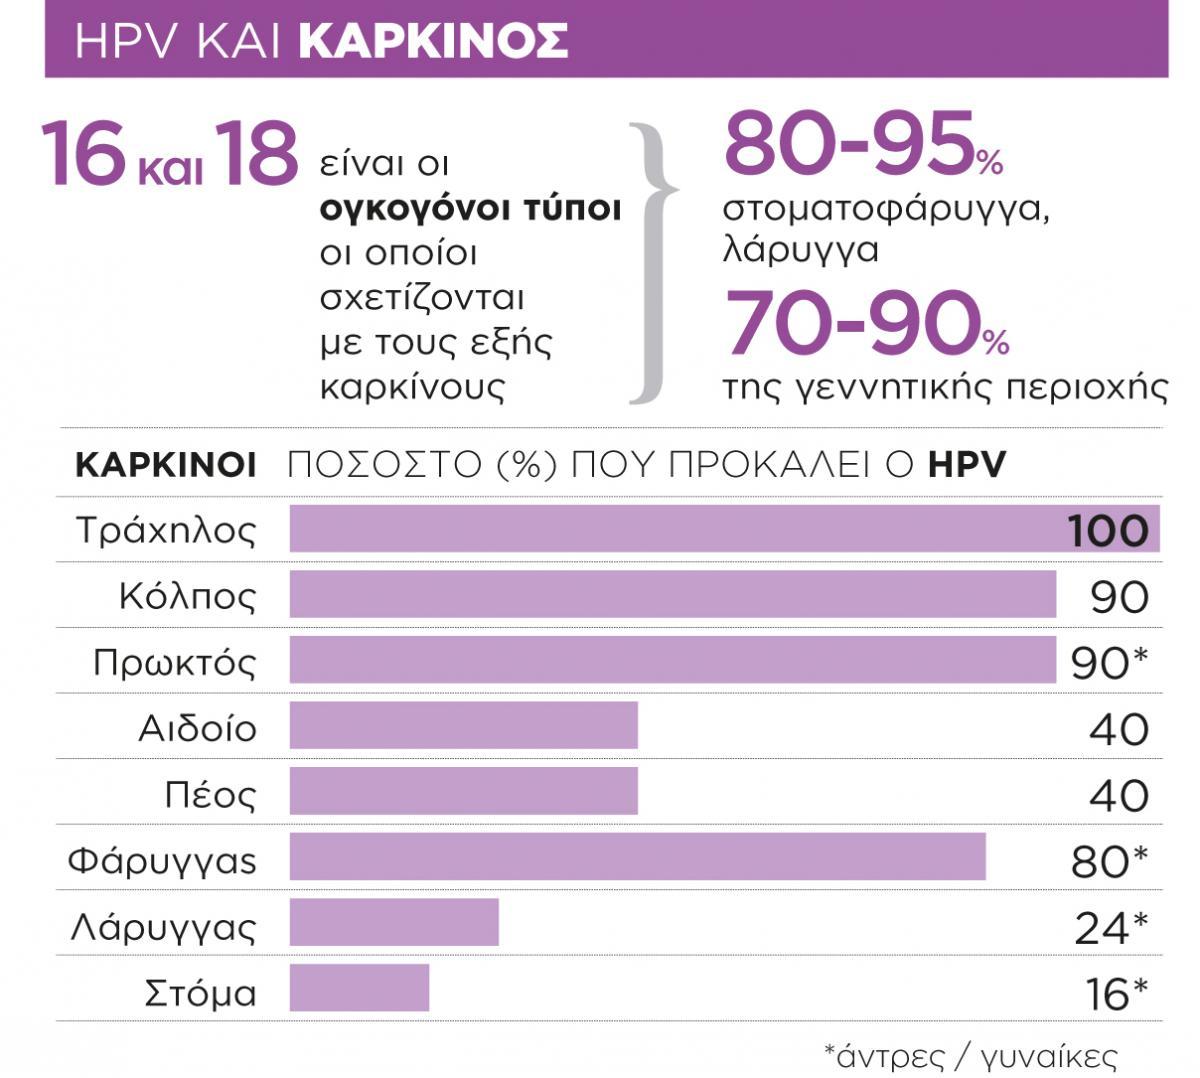 Hpv and urinary problems. Marcu Radu Dragos - Google Scholar-sitater